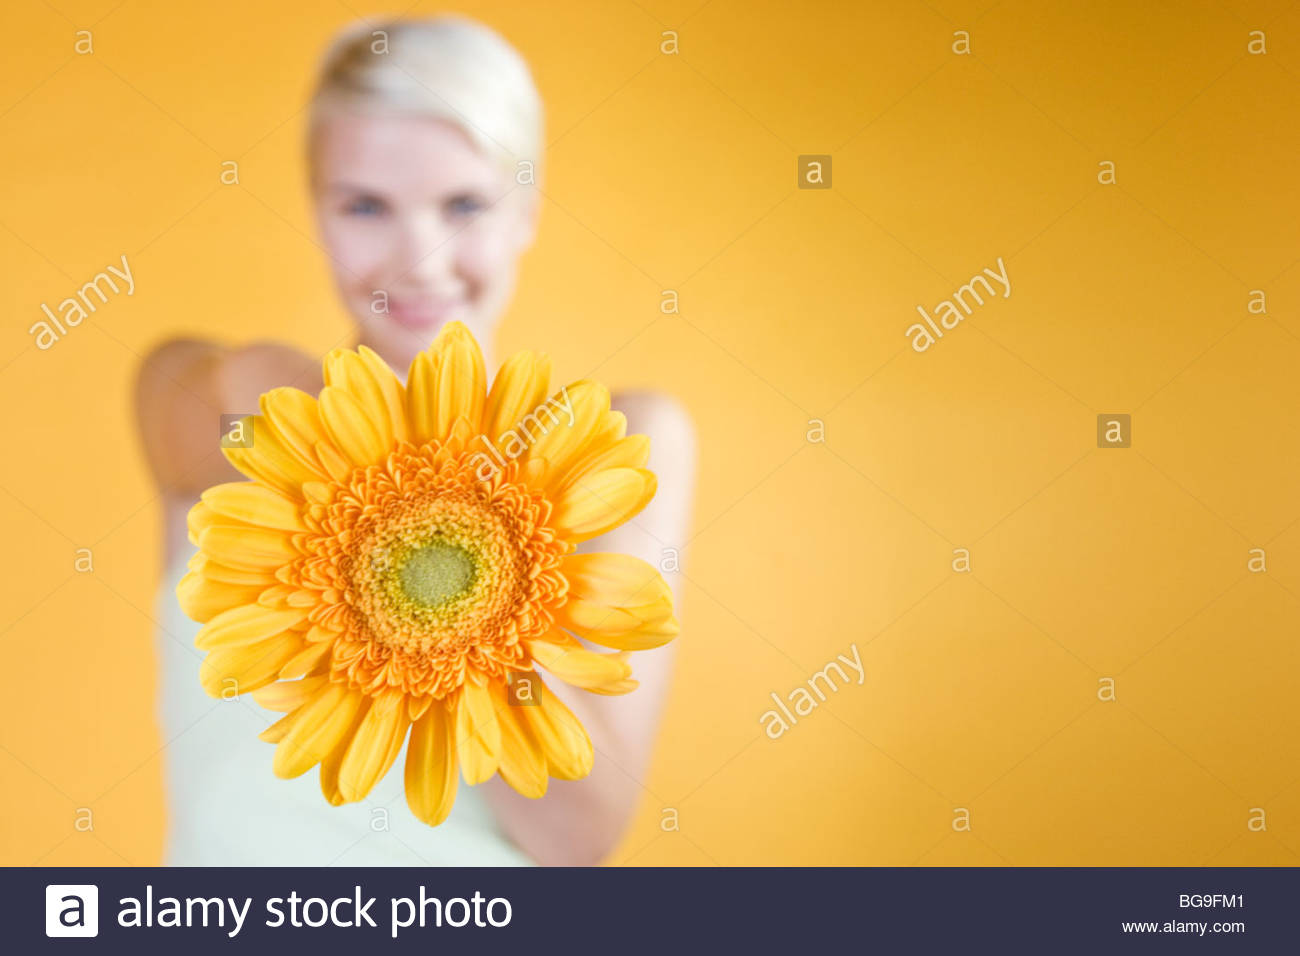 Une jeune femme tenant une fleur orange Photo Stock